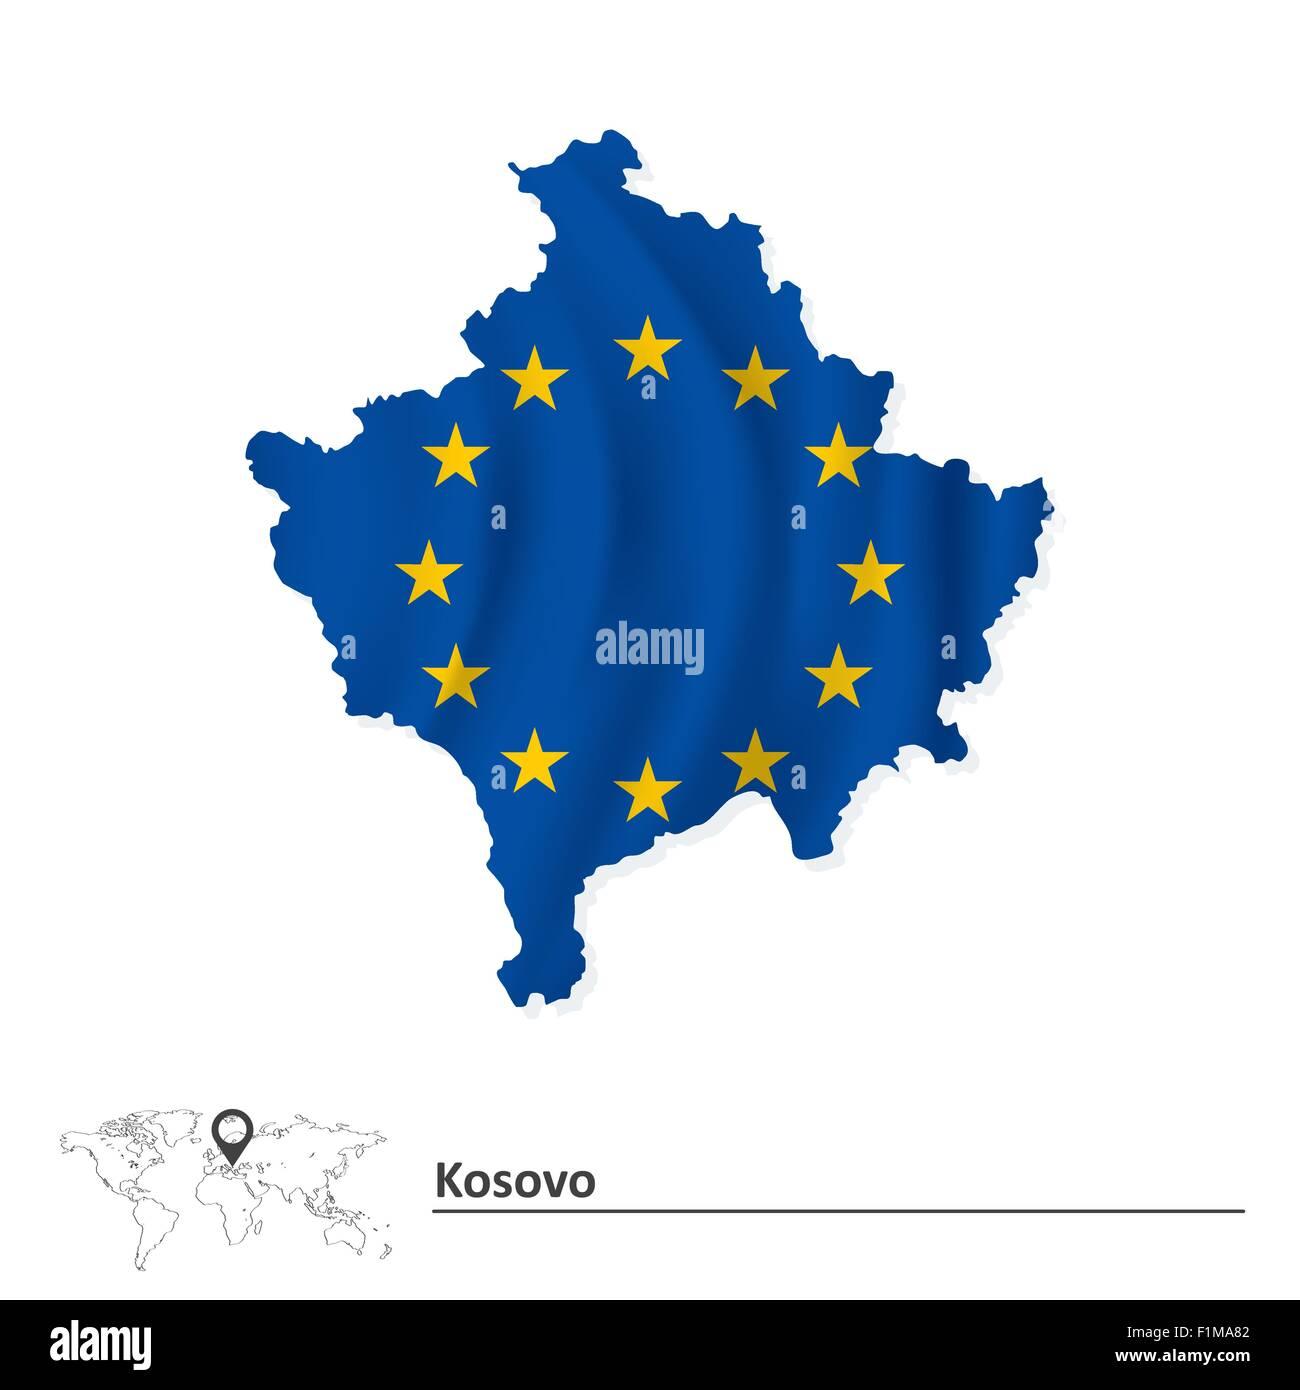 Map Of Kosovo With European Union Flag Vector Illustration Stock